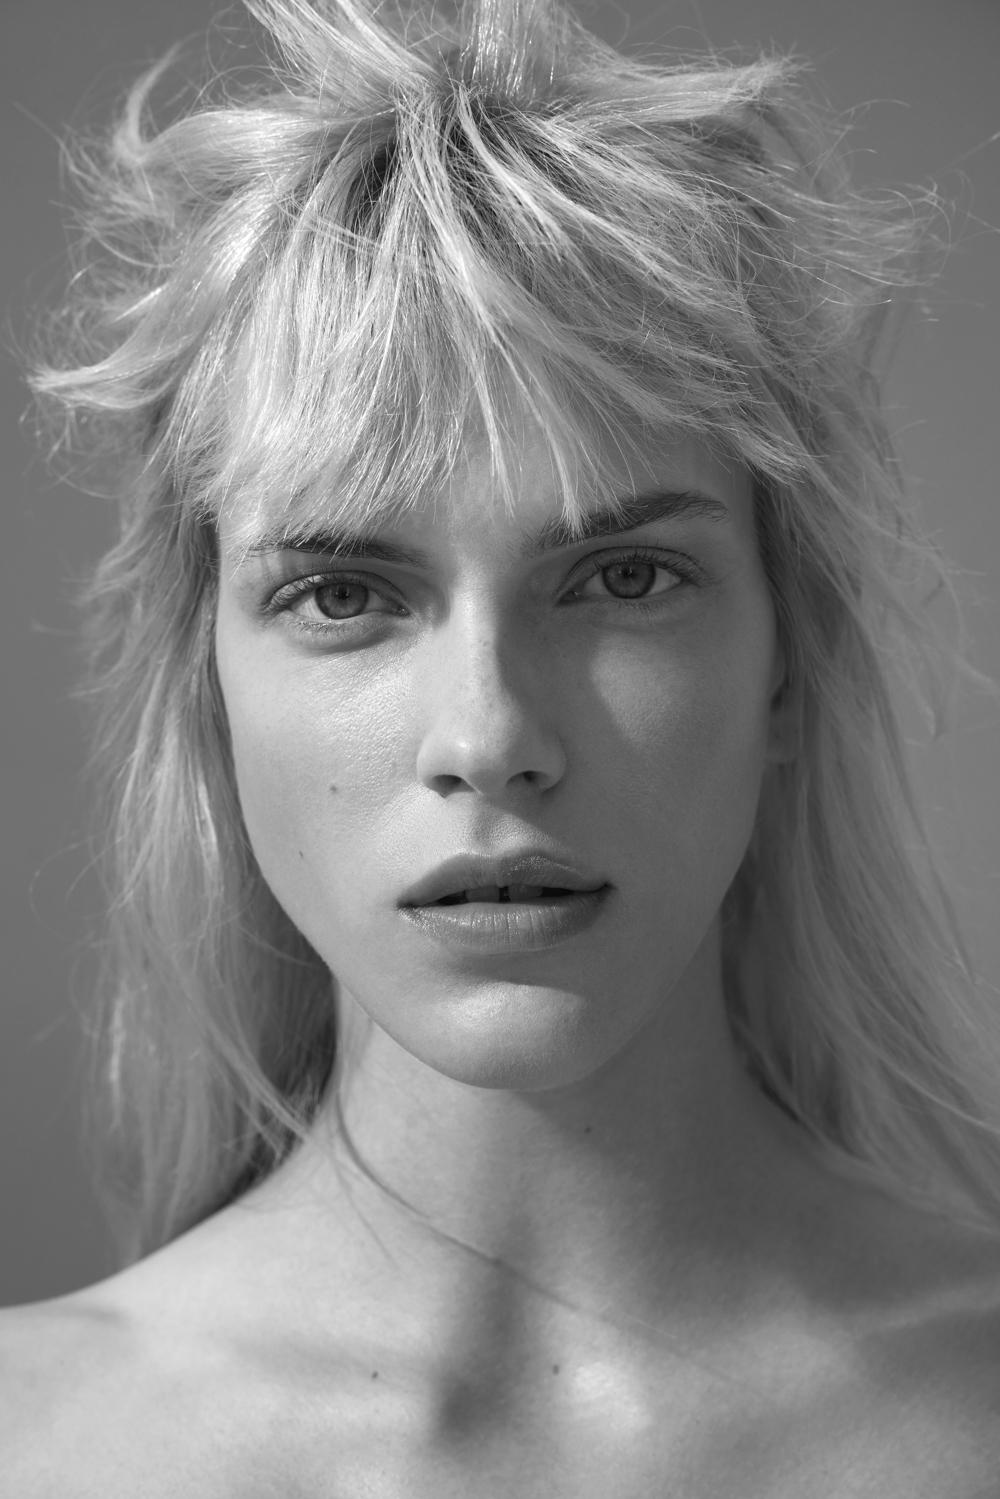 Beaute-StephanieJacquet-0645